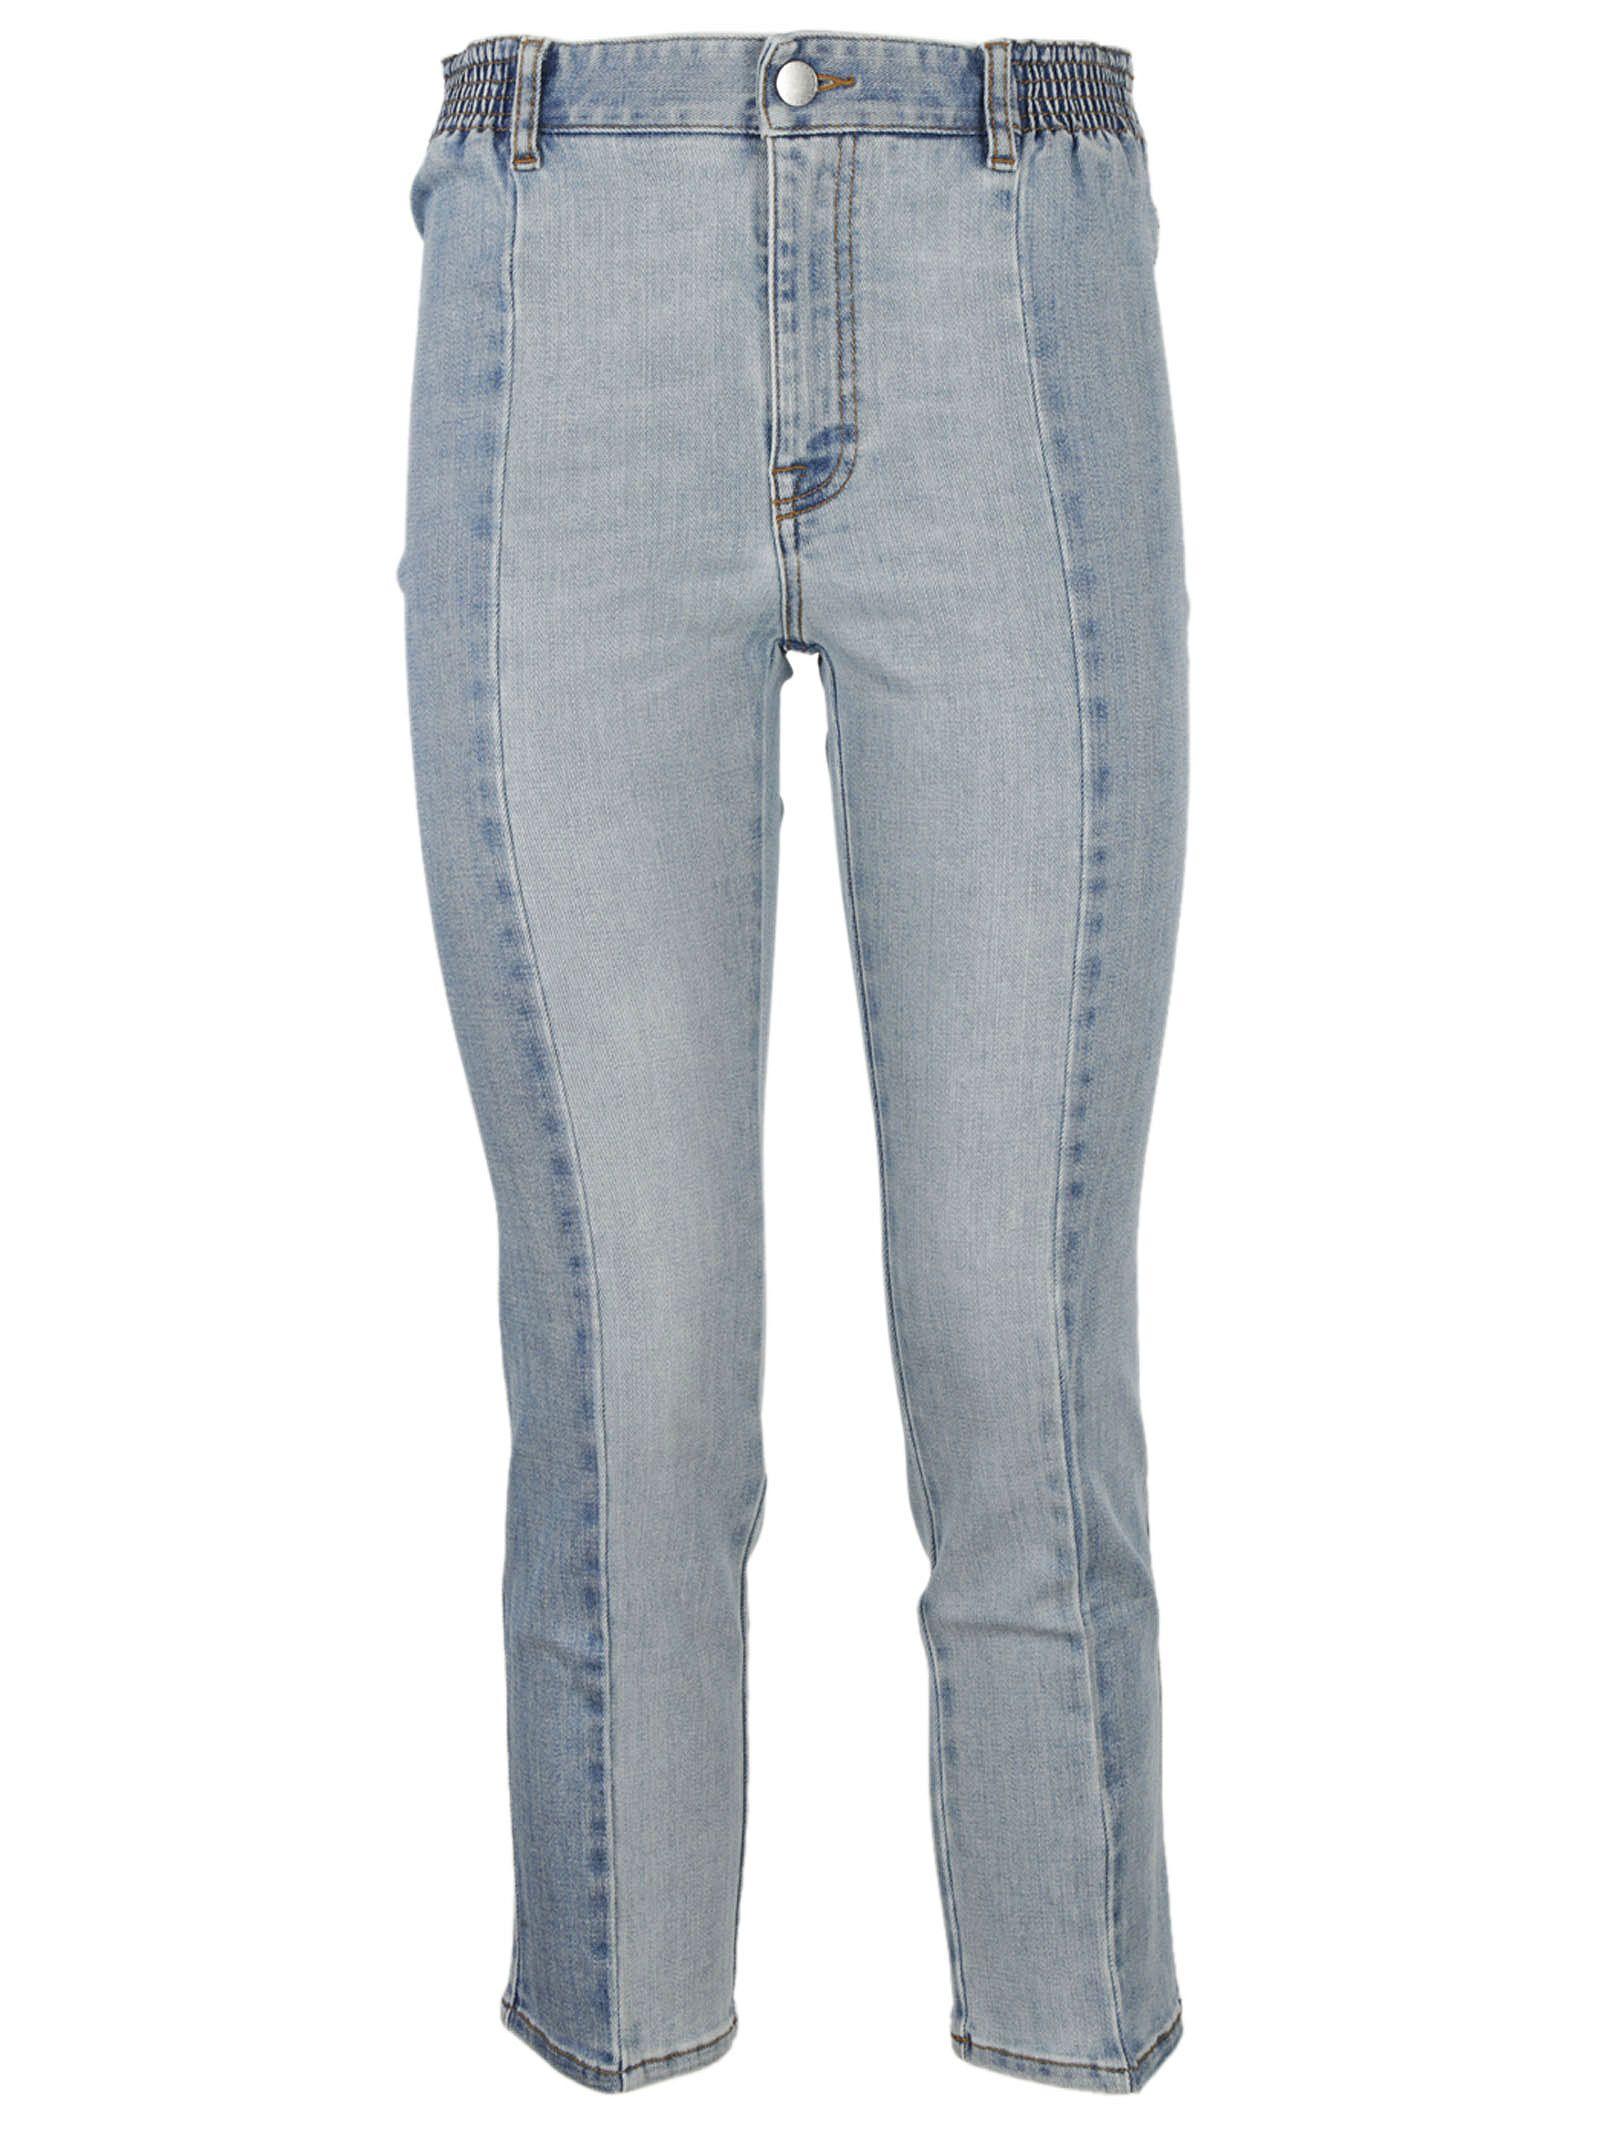 Stella McCartney Paneled Cropped Jeans